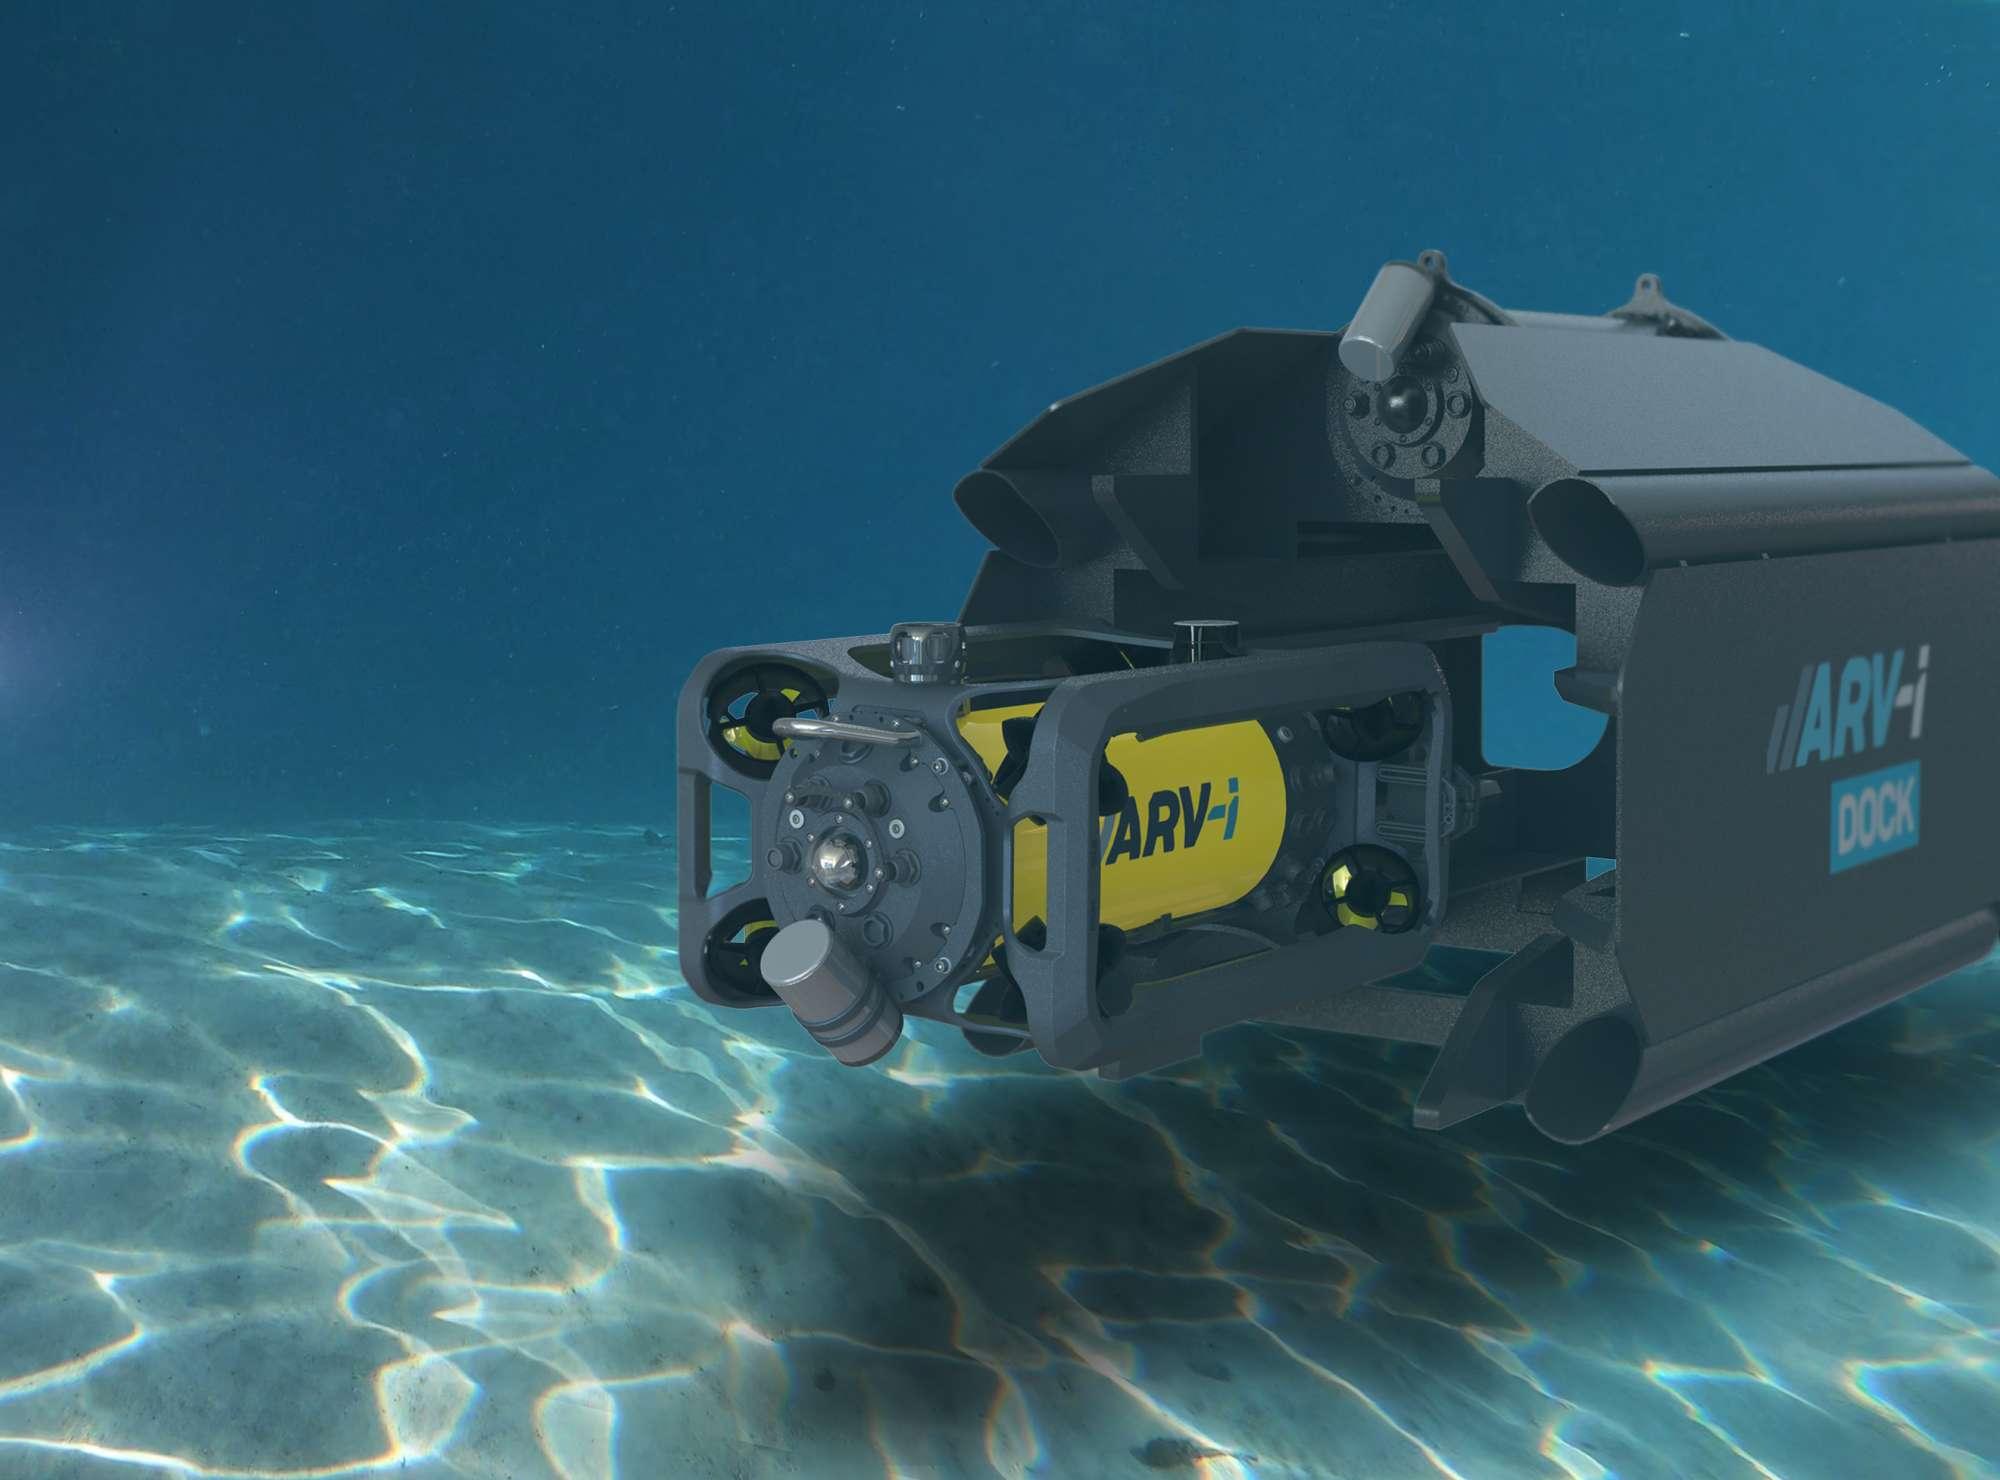 arvi-in-dock-transmark-boxfish-research